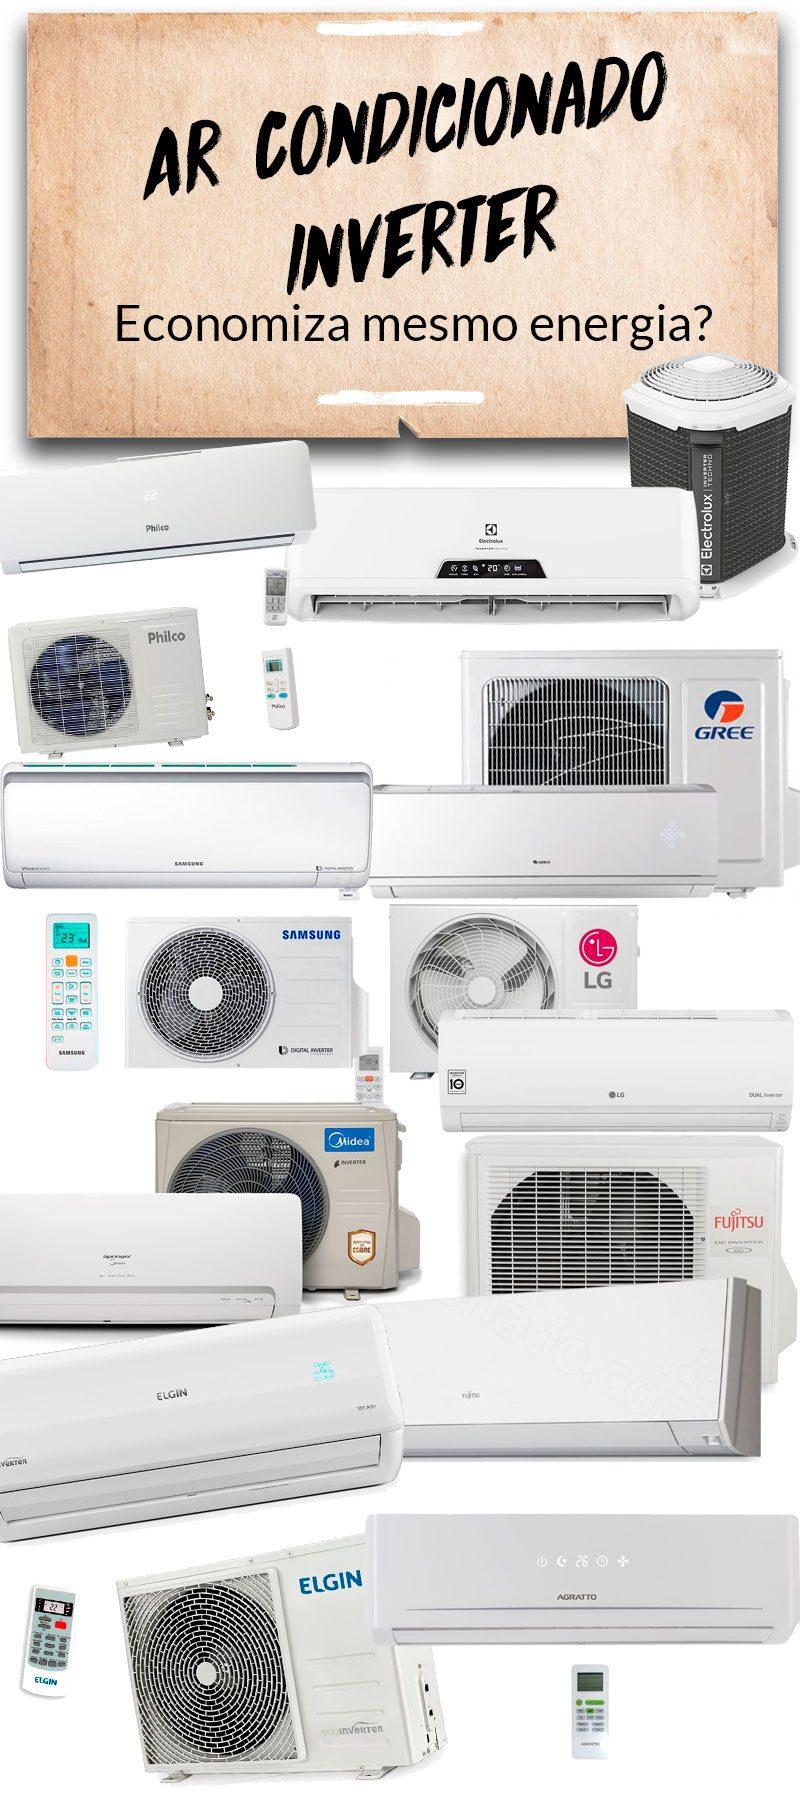 ar condicionado inverter economiza energia